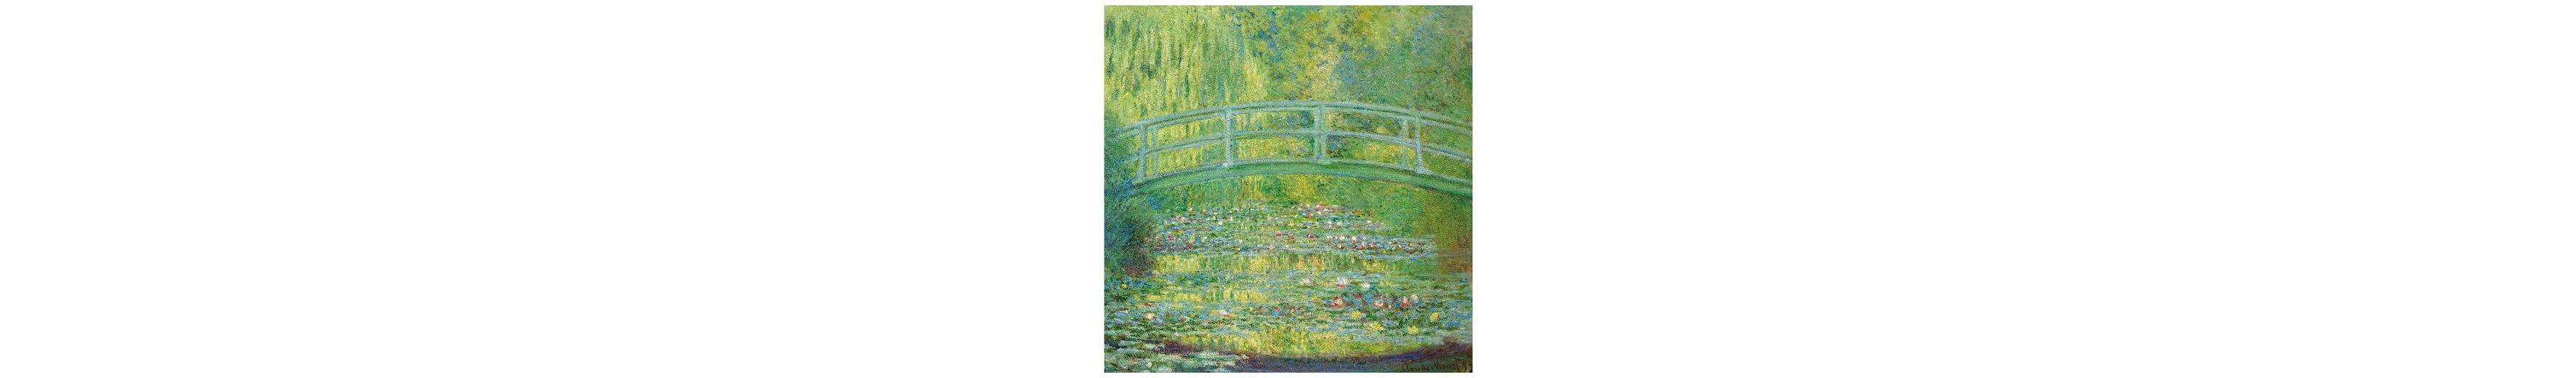 Home affaire Fototapete »Monet - Seerosenteich«, 250/250 cm